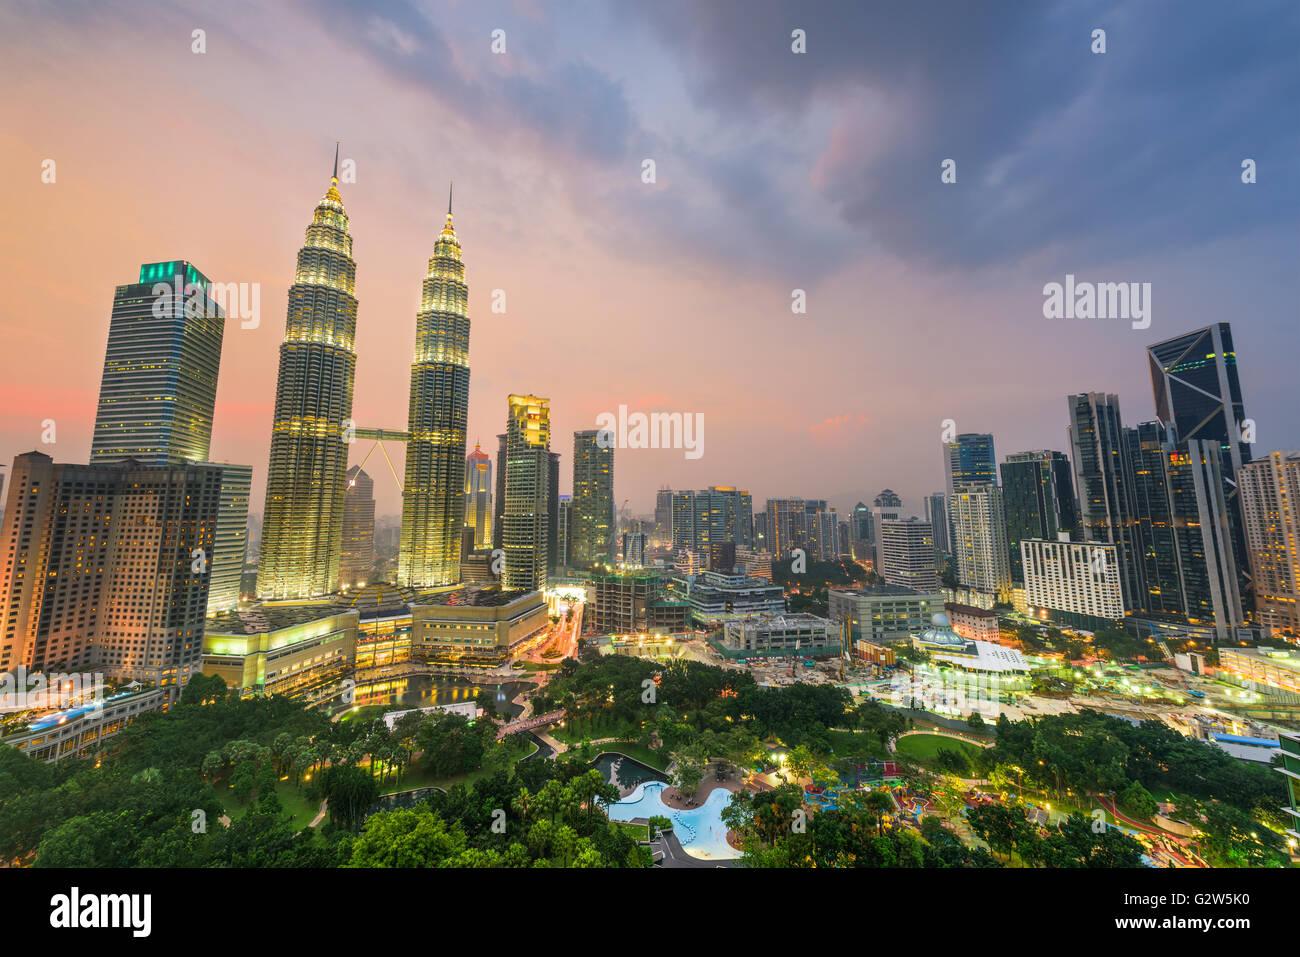 Horizonte de Kuala Lumpur, Malasia. Imagen De Stock